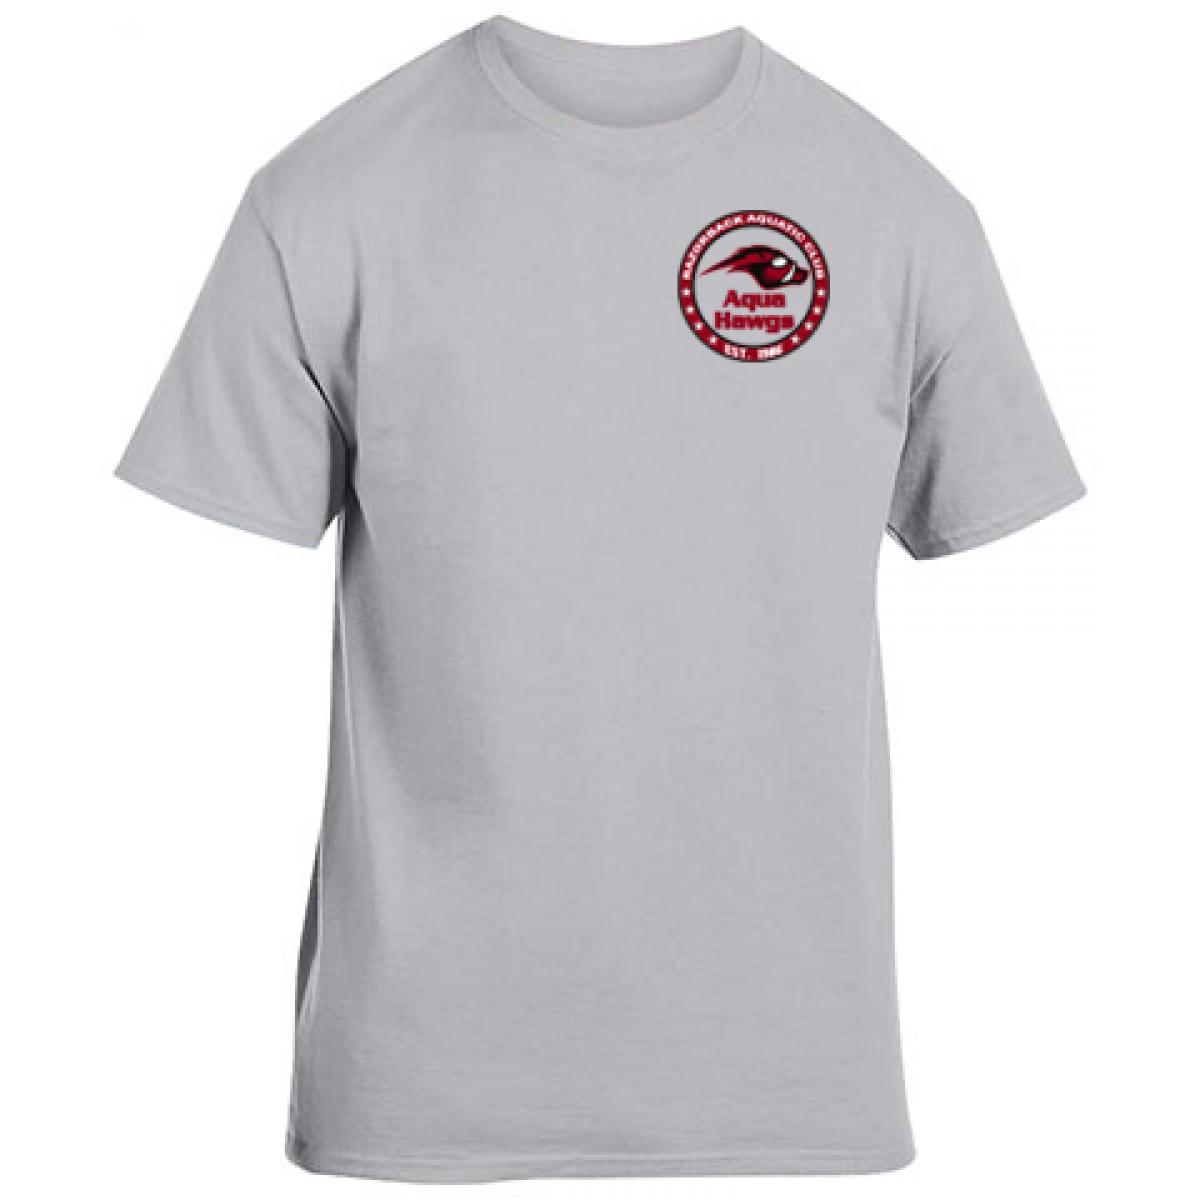 Cotton Short Sleeve T-Shirt Gray-Gray -XL